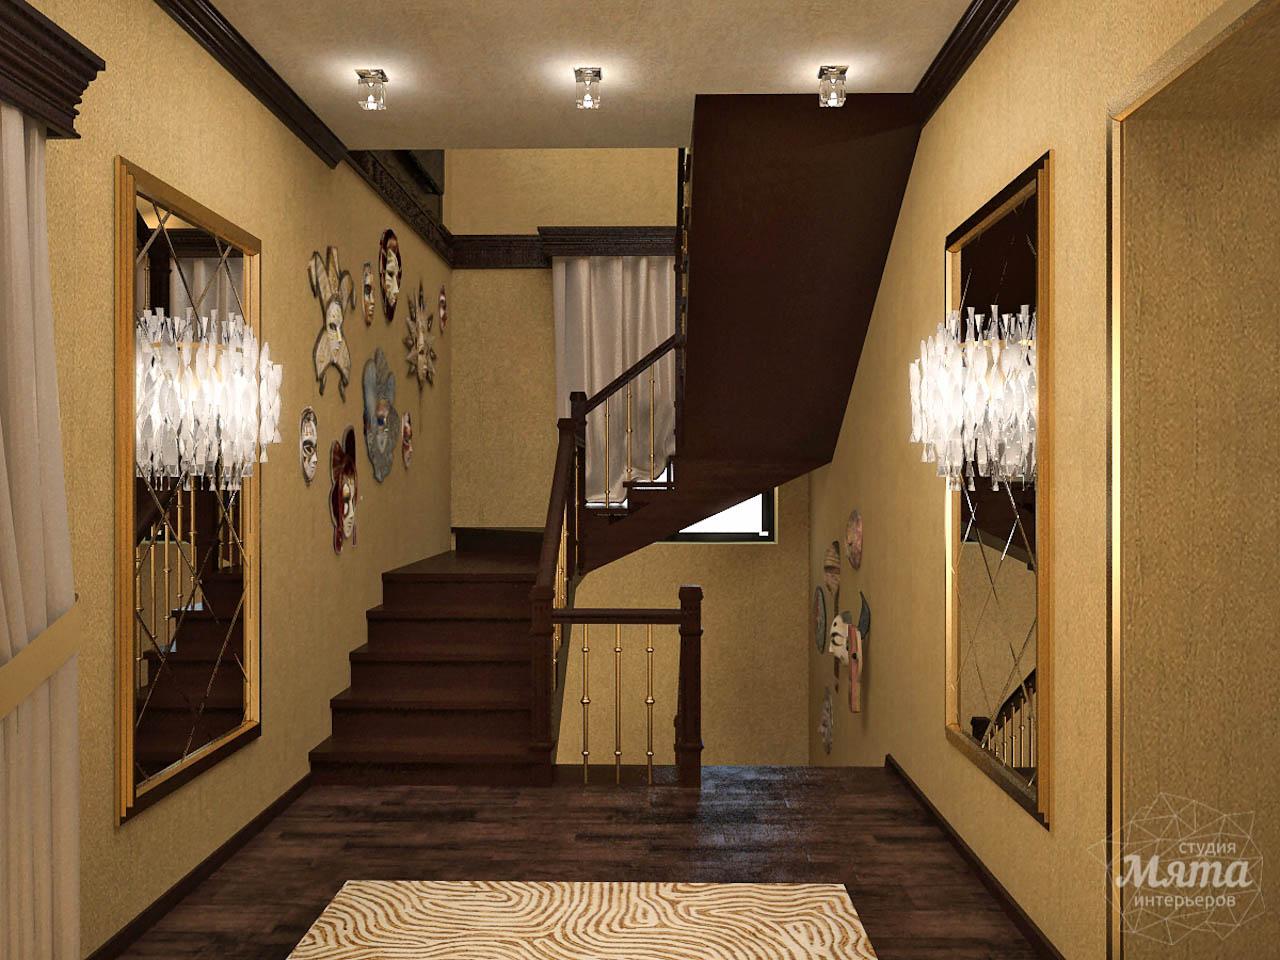 Дизайн интерьера коттеджа по ул. Ландышевая 23 img1774814069